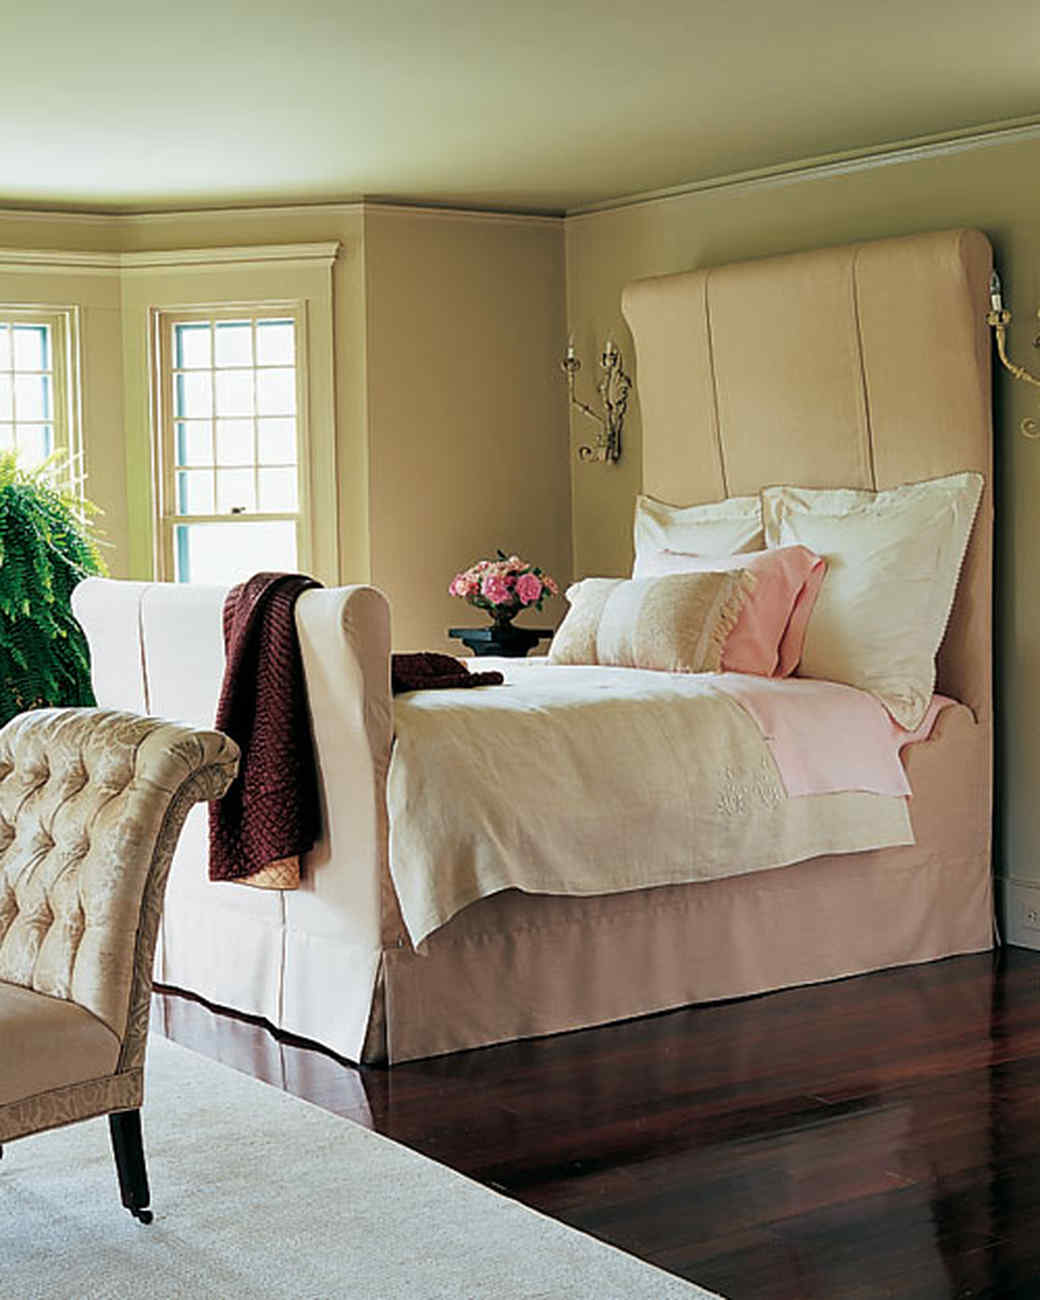 msl_feb03_209z1_bedroom.jpg